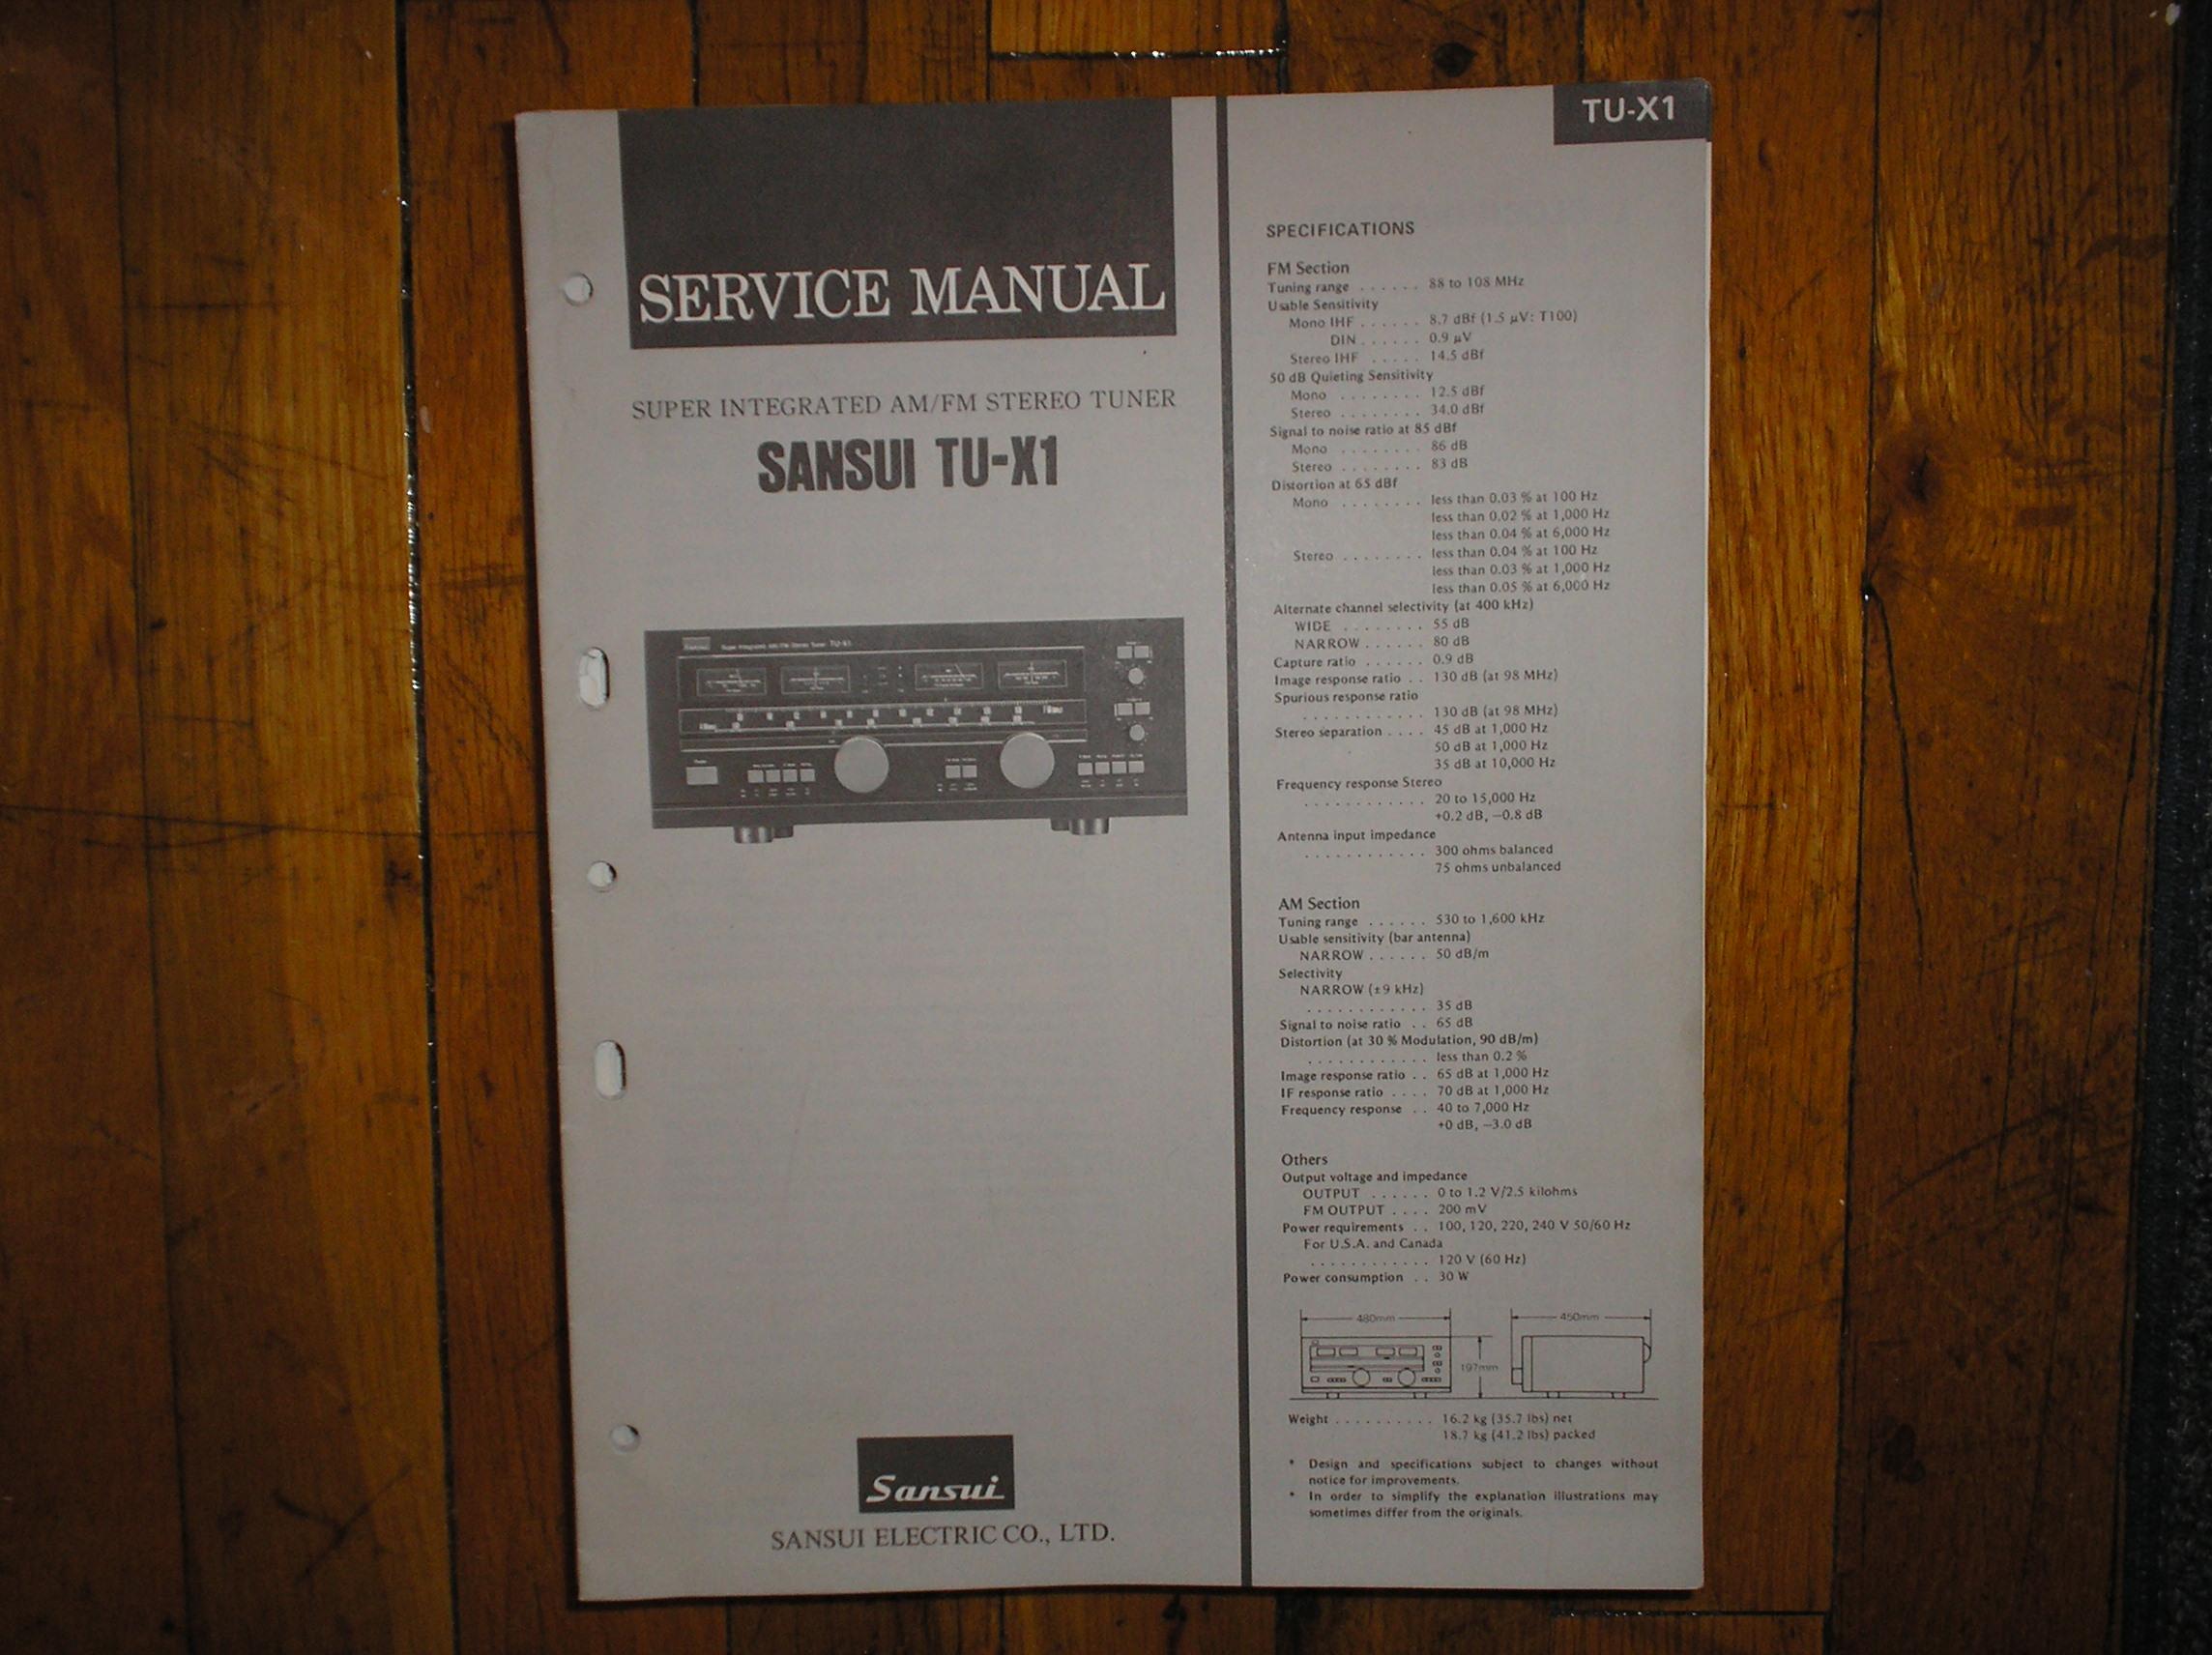 TU-X1 Tuner Service Manual